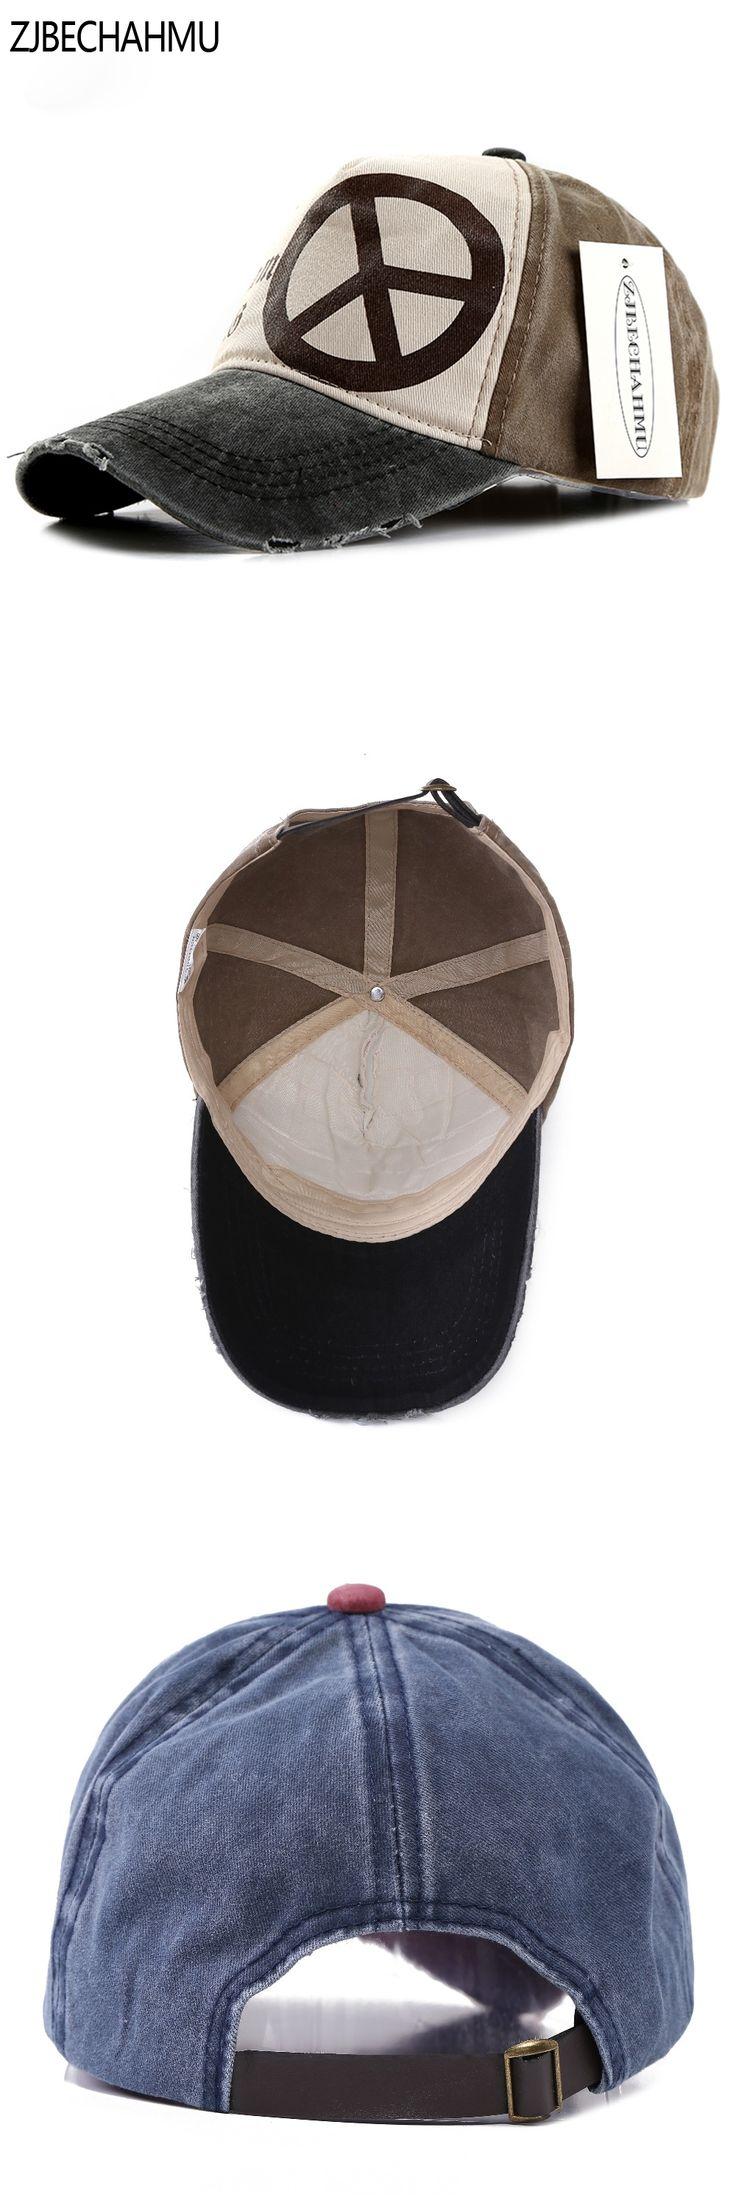 2017 New wholesale baseball cap snapback hat spring cotton cap hip hop fitted cap cheap hats for men women summer cap